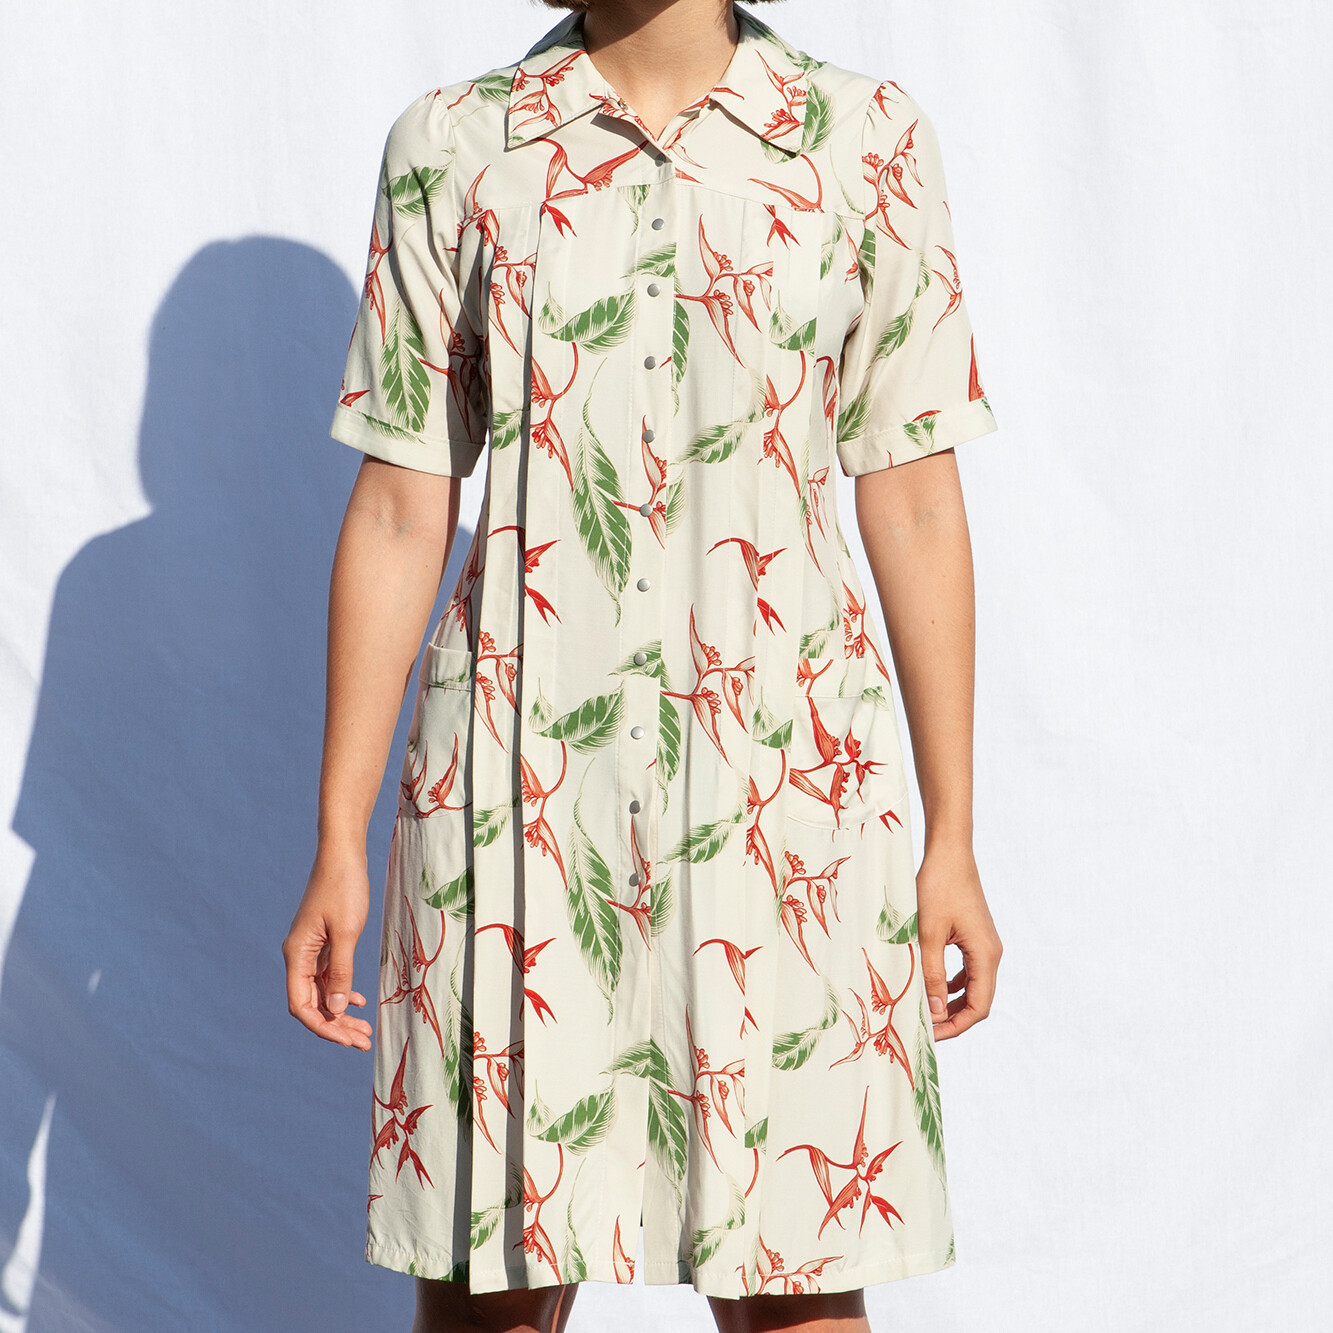 W'MENSWEAR ALOHA OFF-DUTY DRESS